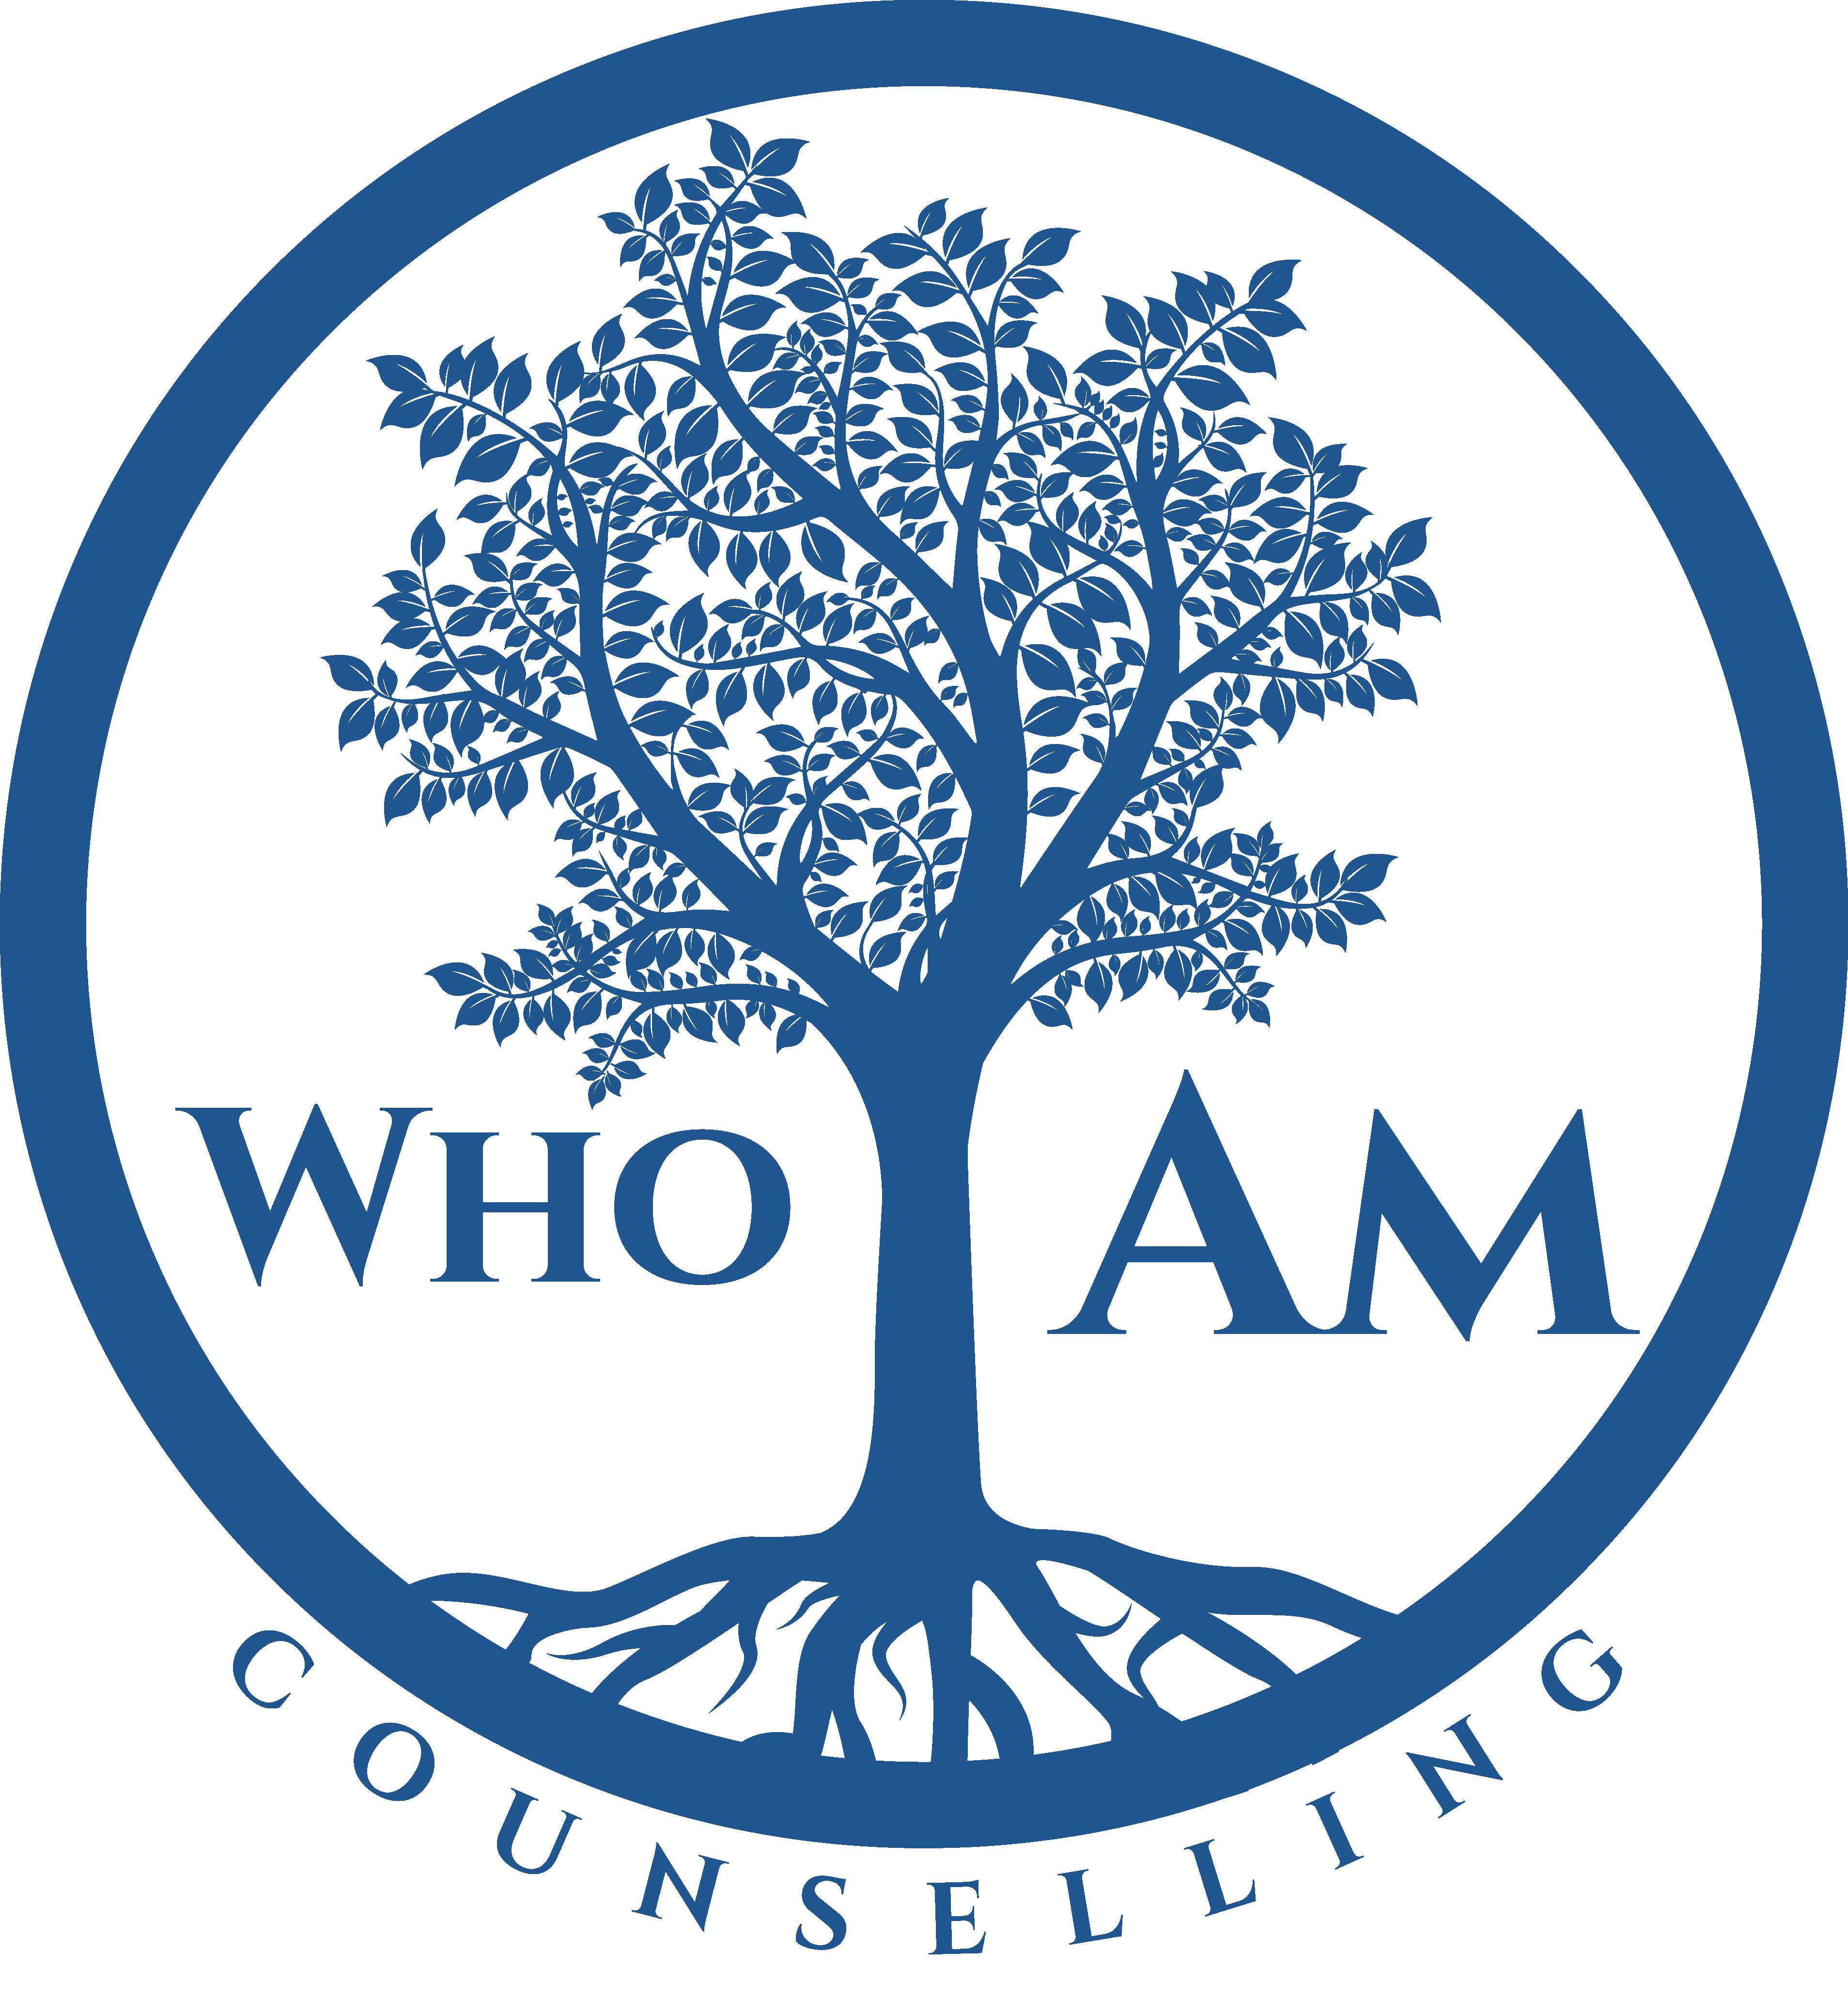 who I am blue logo